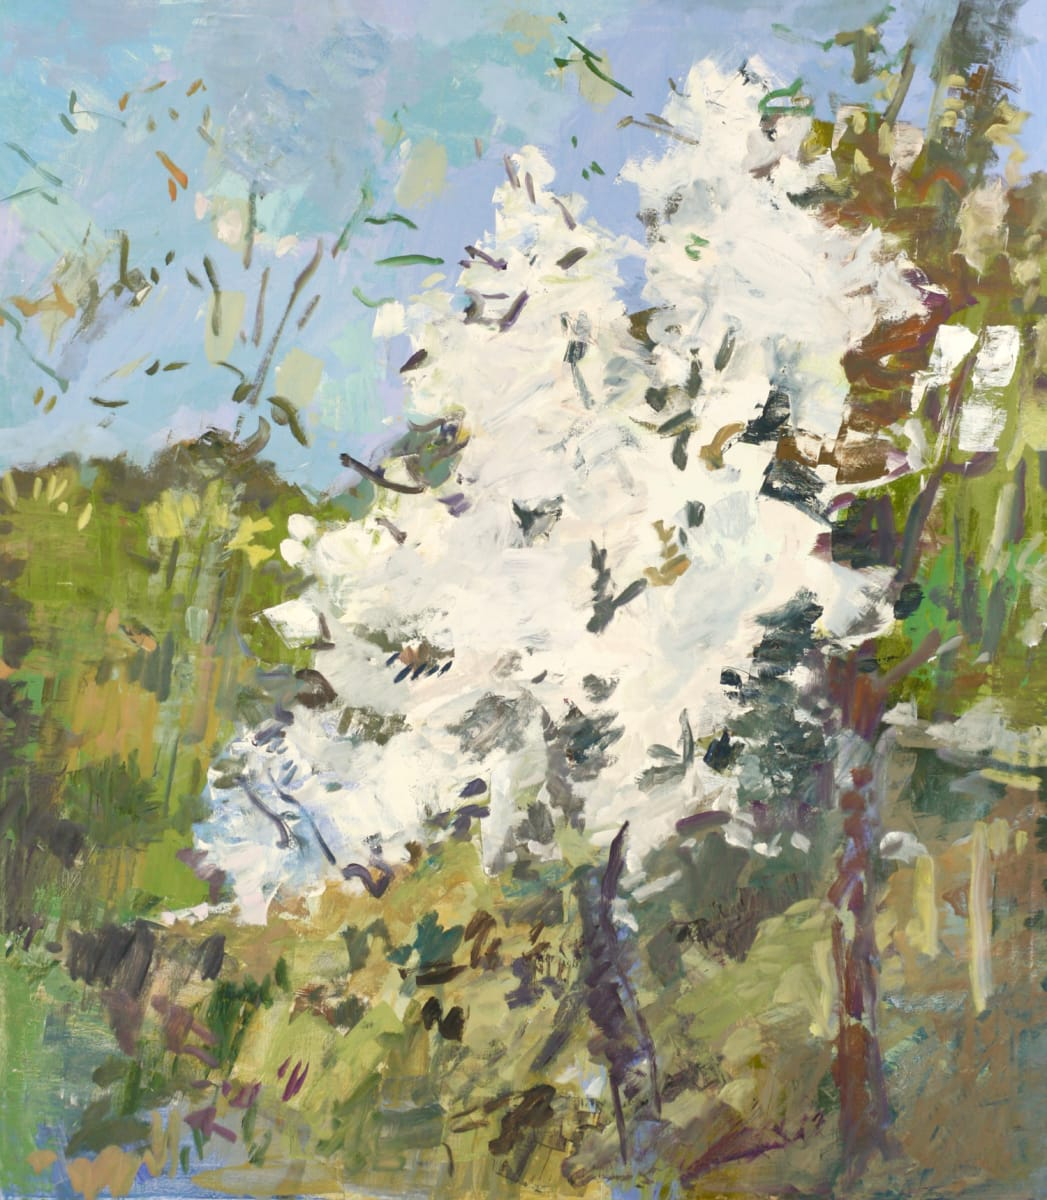 Hodges 4 by Ryan Cobourn